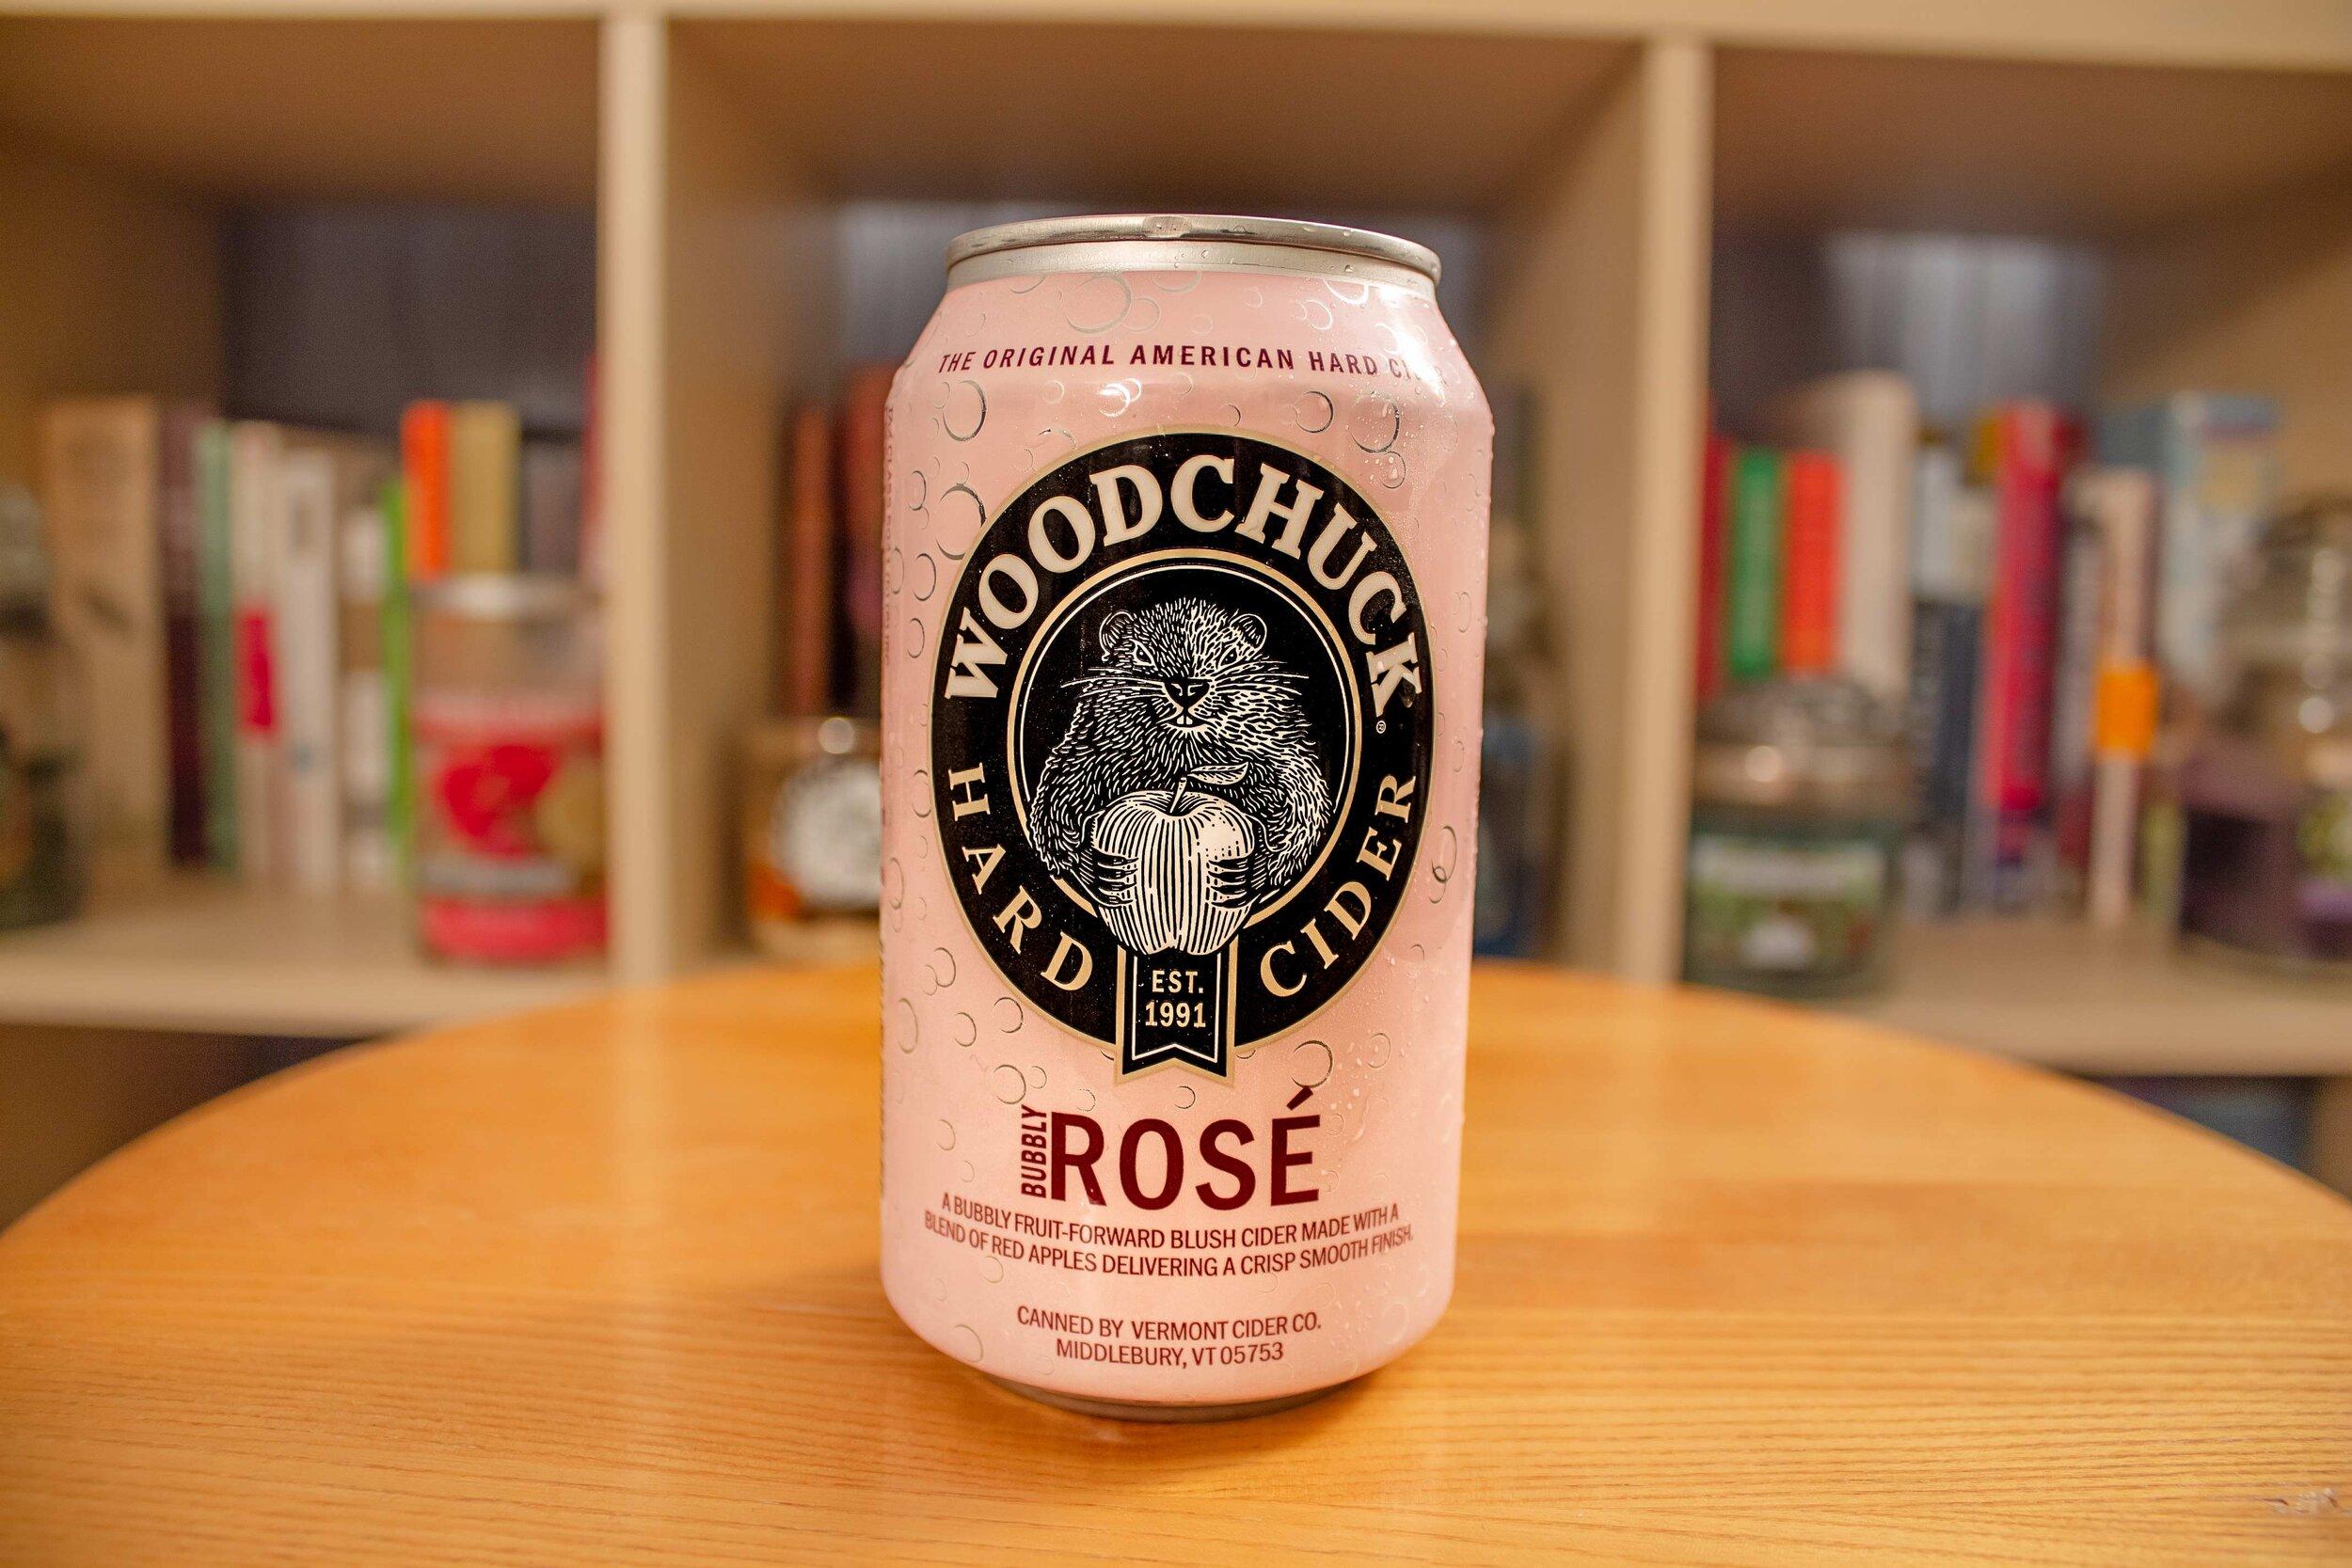 Woodchuck Bubby Rosé